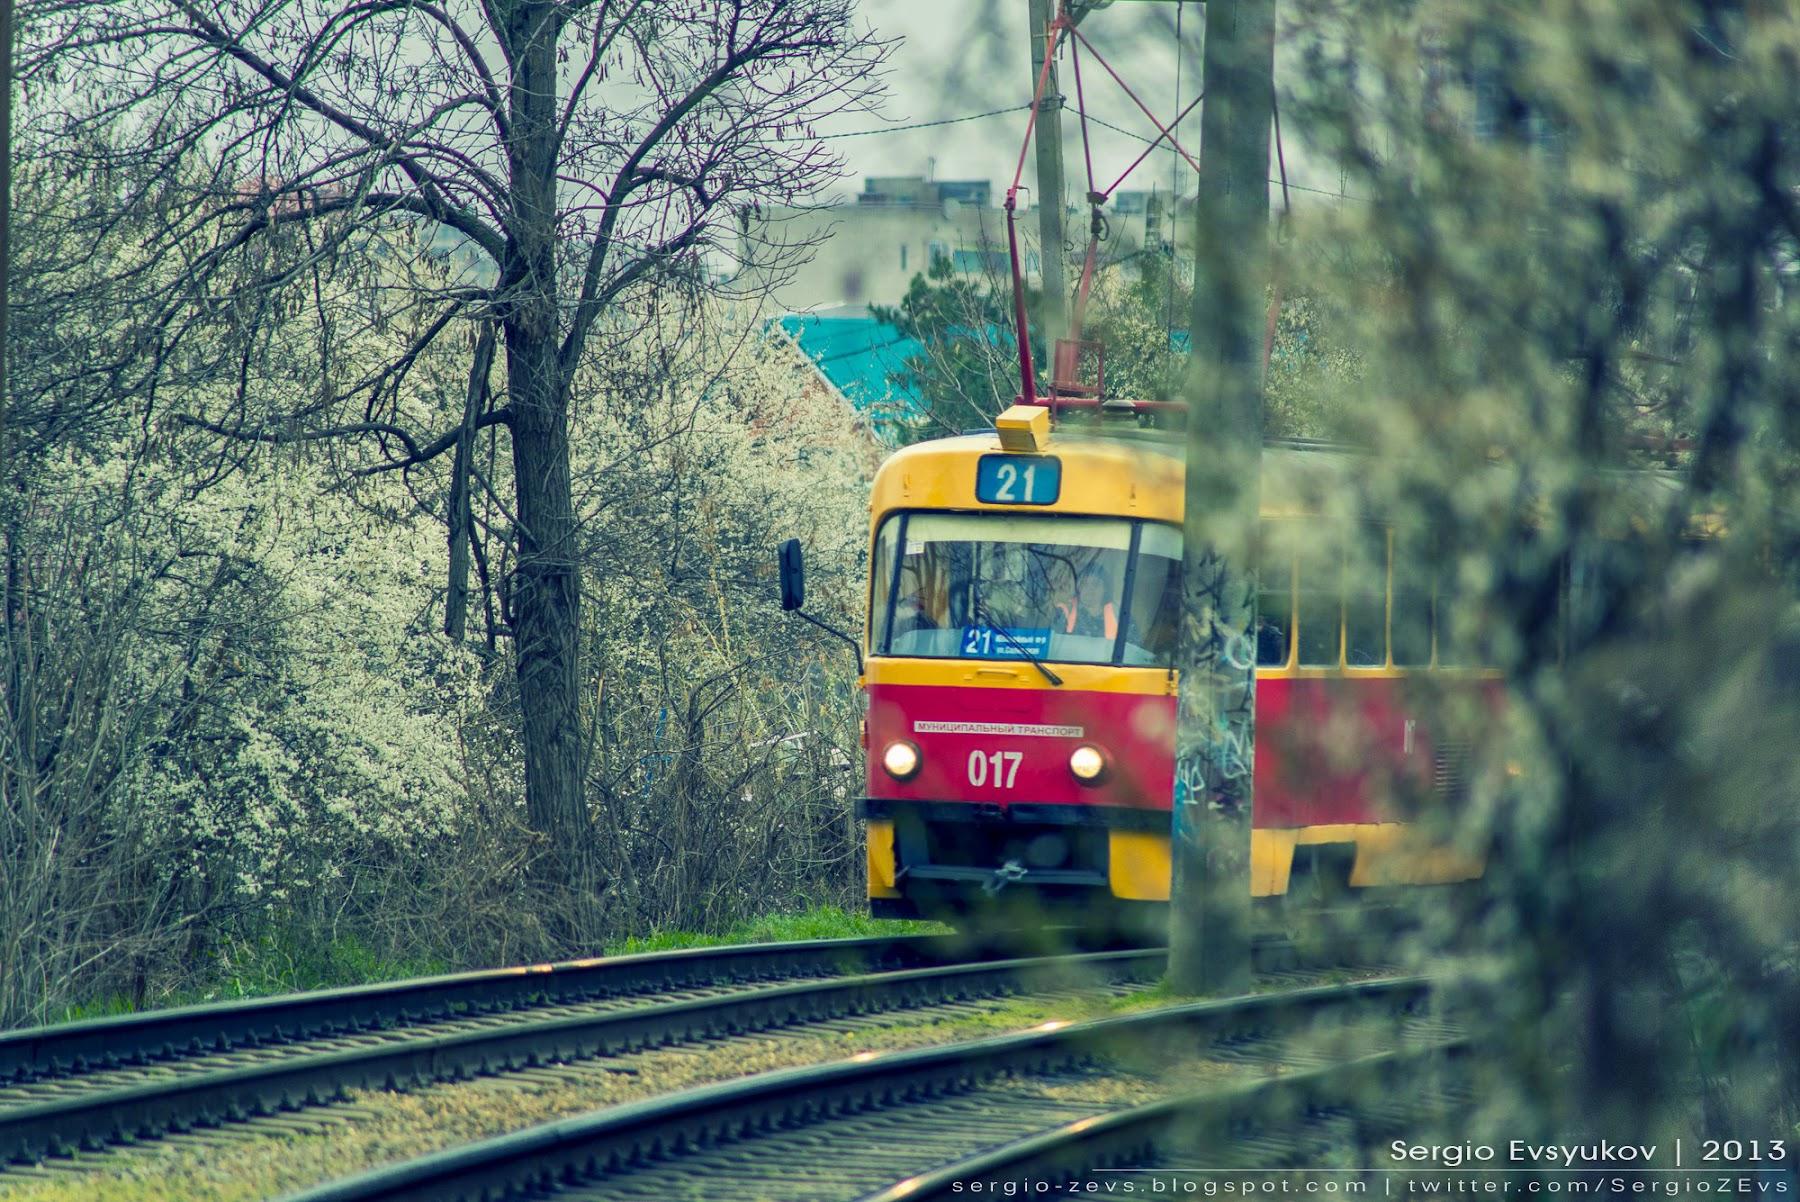 Весна, Краснодар, Кубань, рельсы, депо, деревья, маршрут